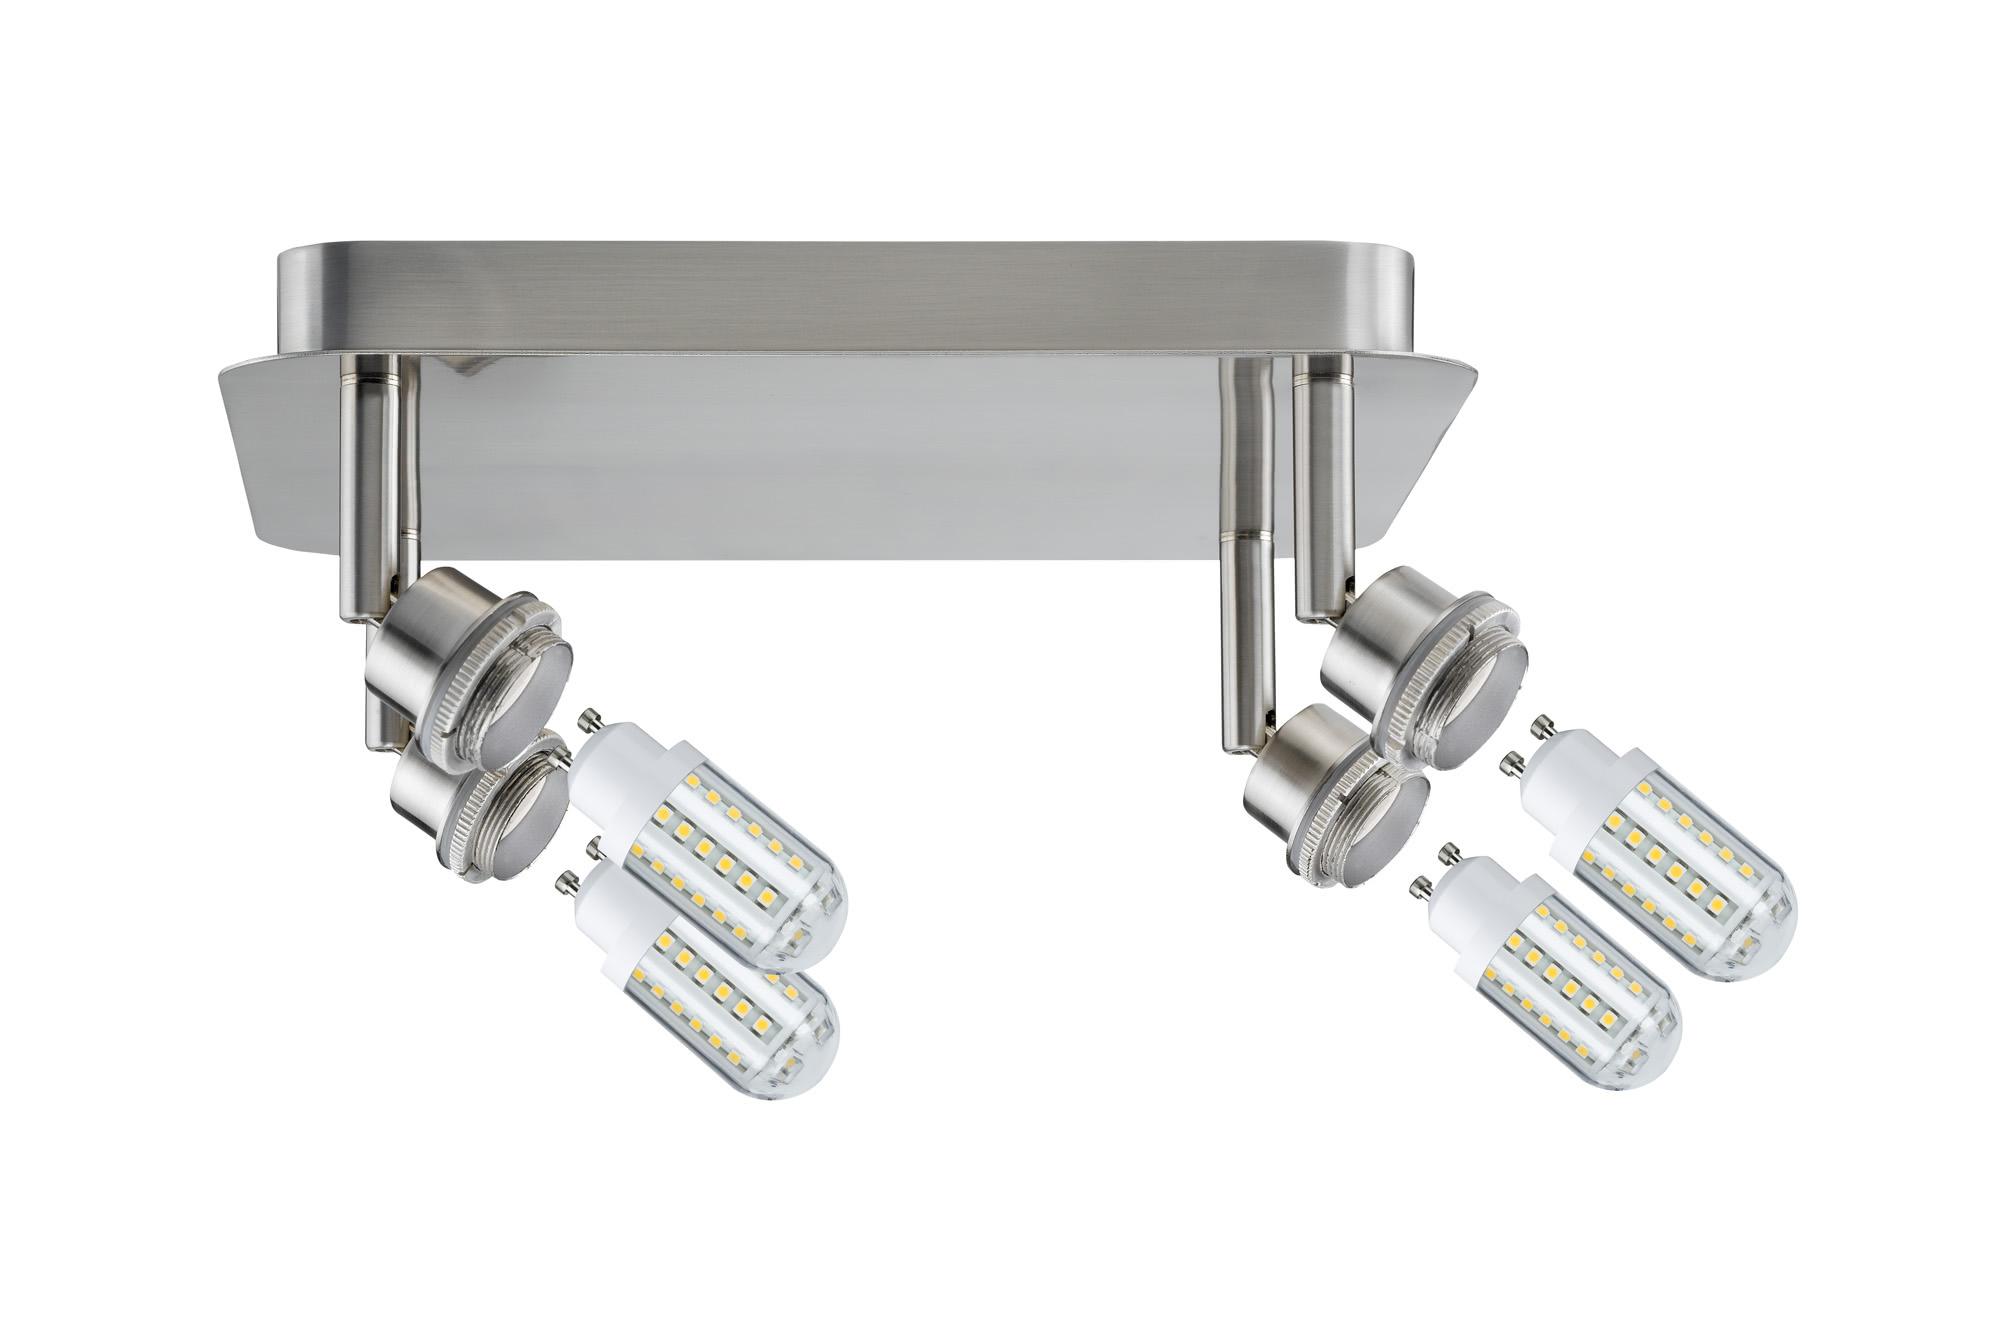 Paulmann. 60313 SL Deco LED Rondell 4x3W GZ10 Eis-g